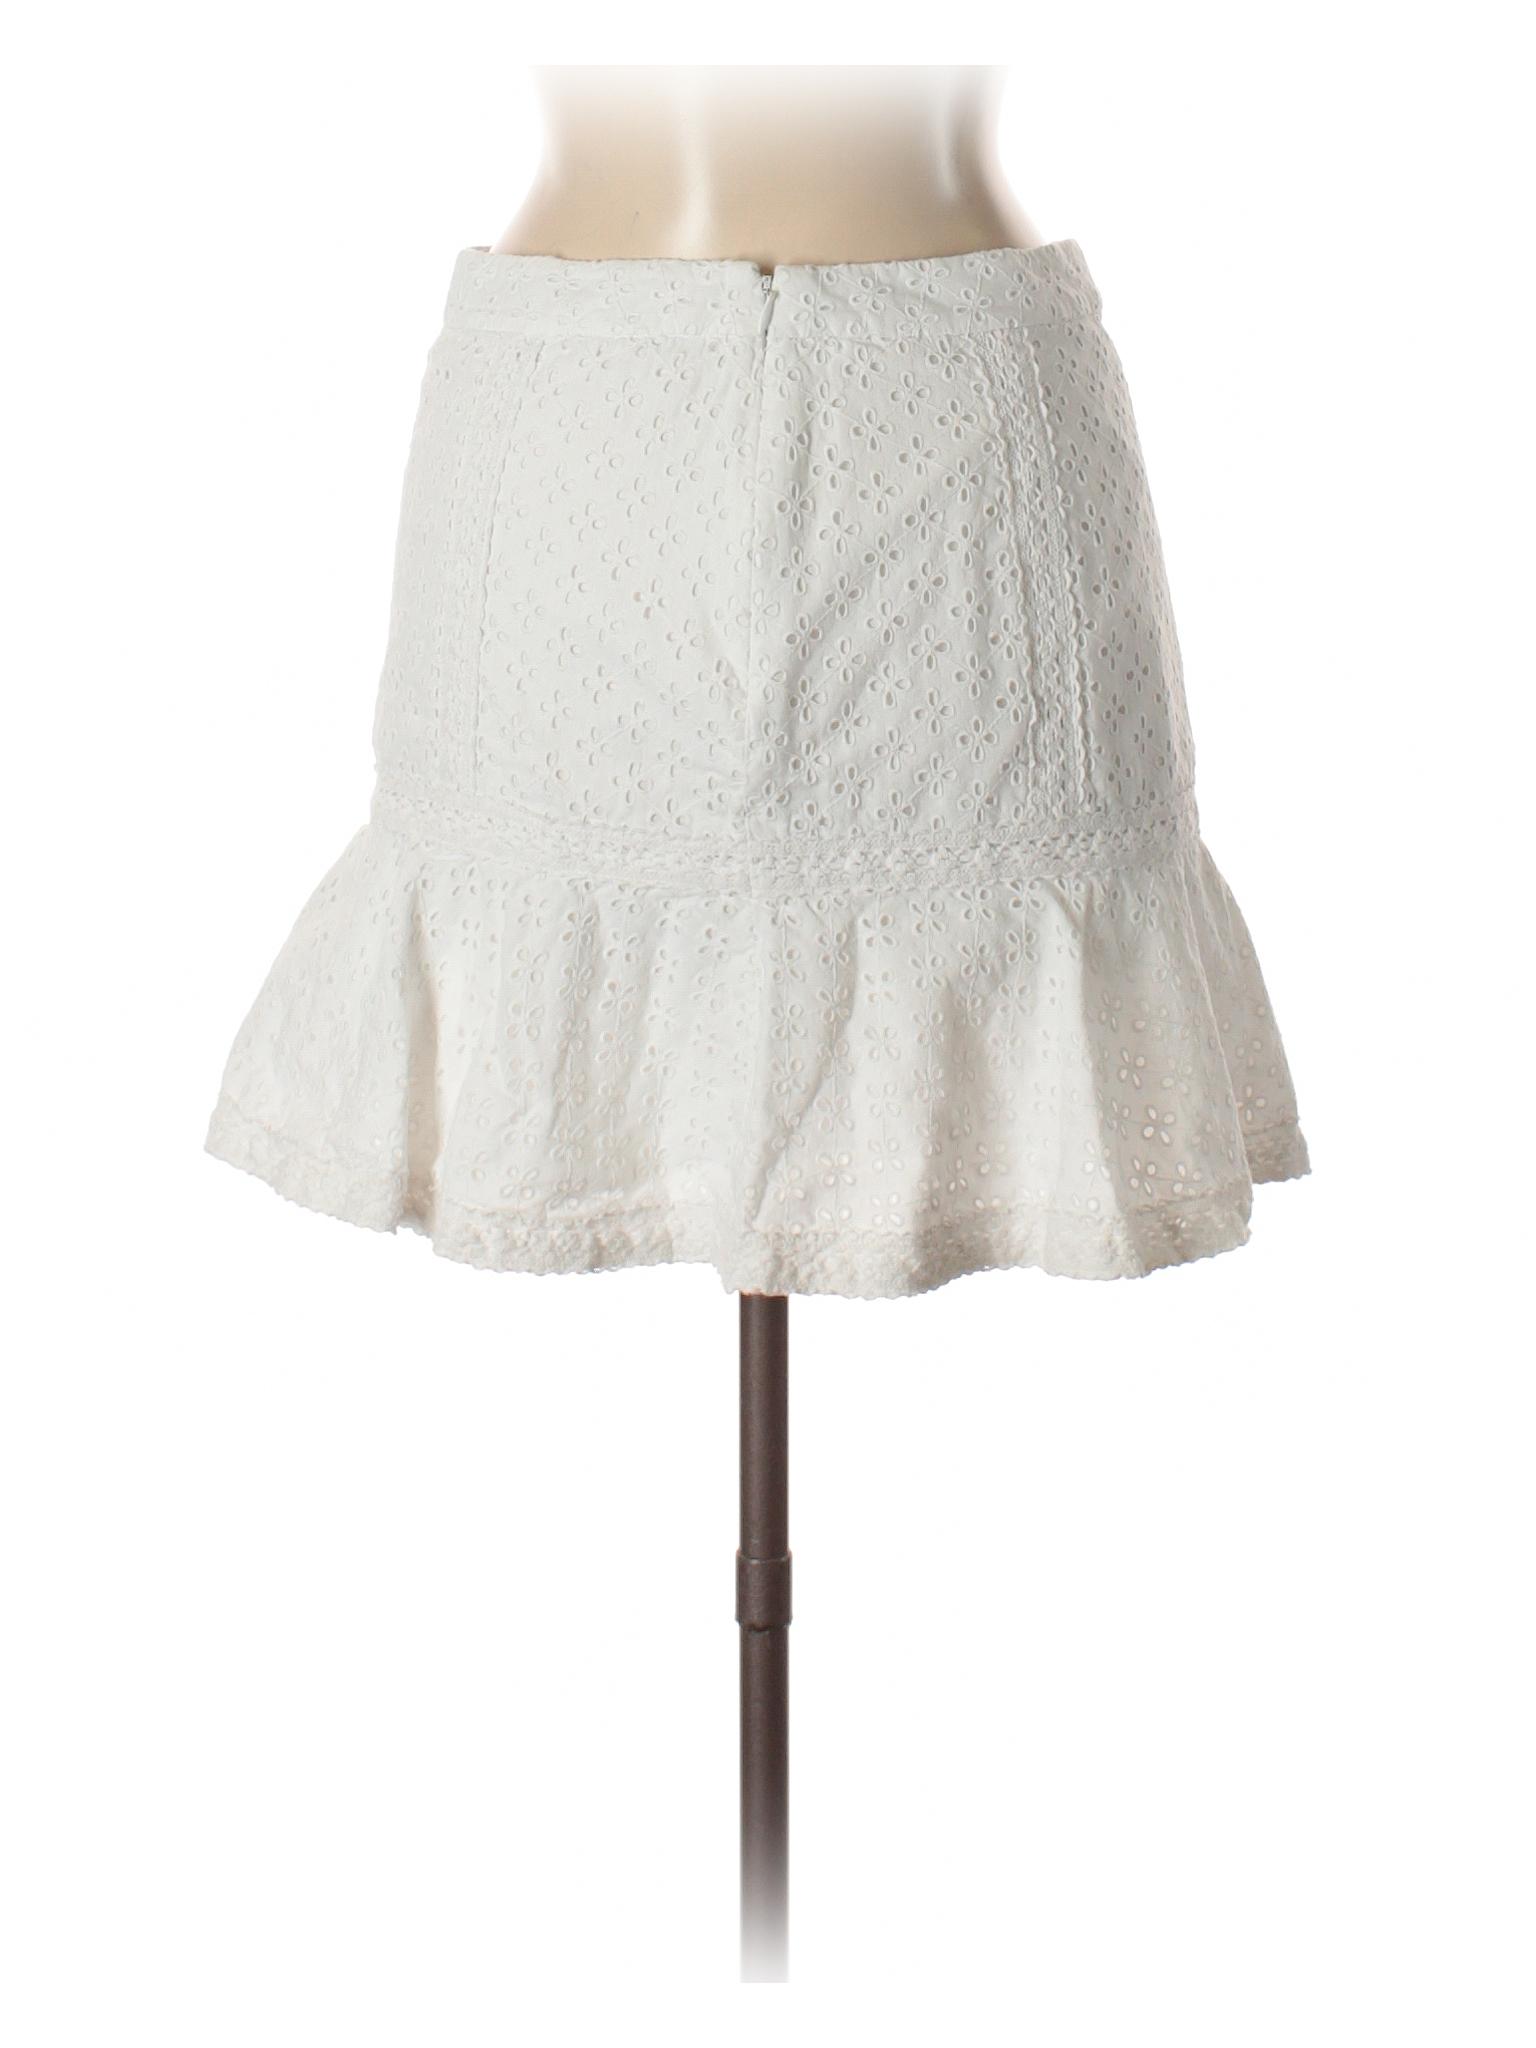 Casual Skirt Leisure Boutique Vines Vineyard xwqv04nZX